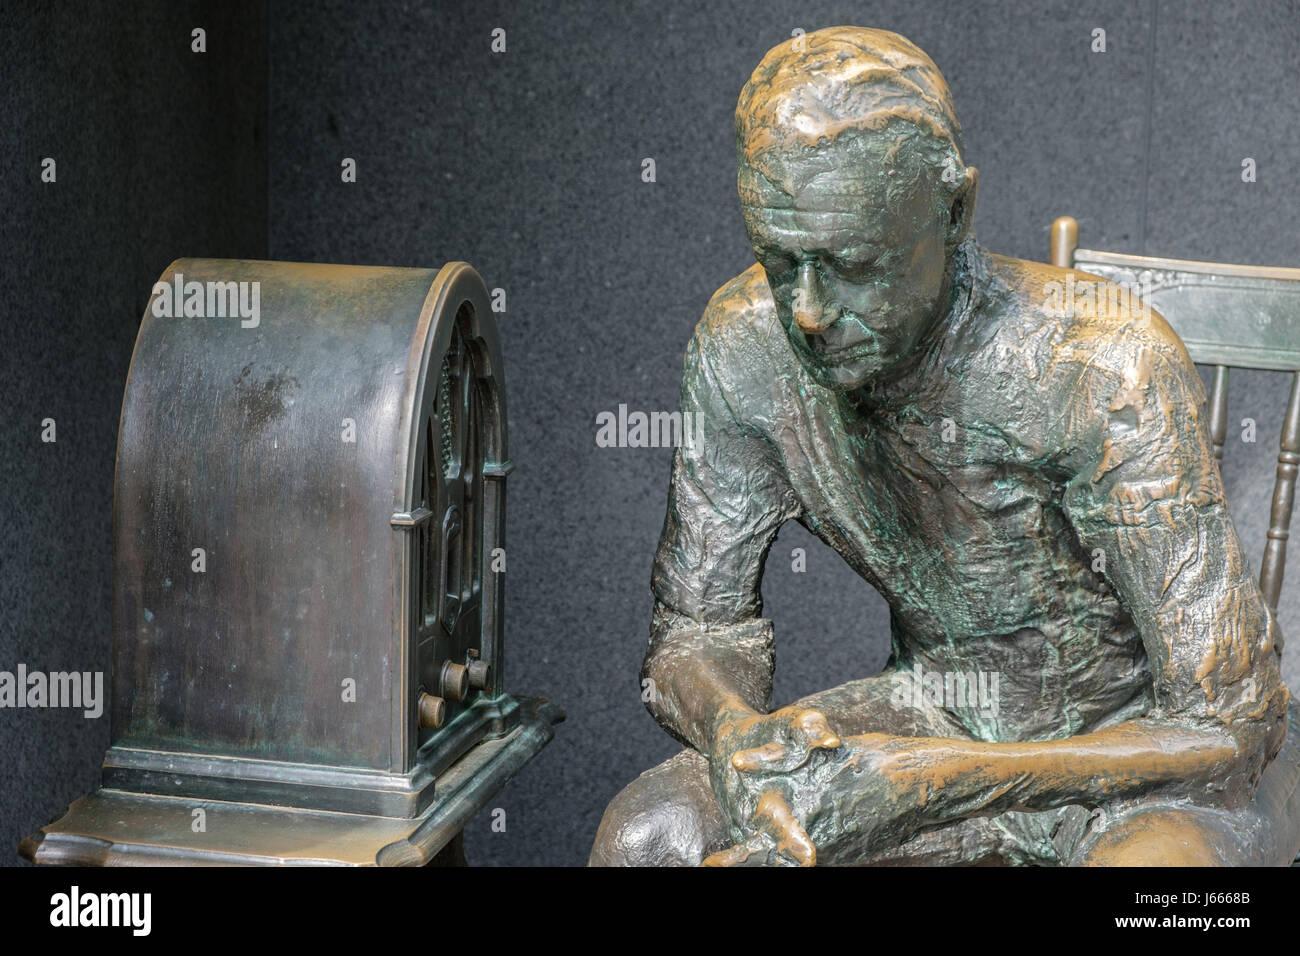 Fireside Chat Closeup, FDR Memorial, Washington, DC - Stock Image